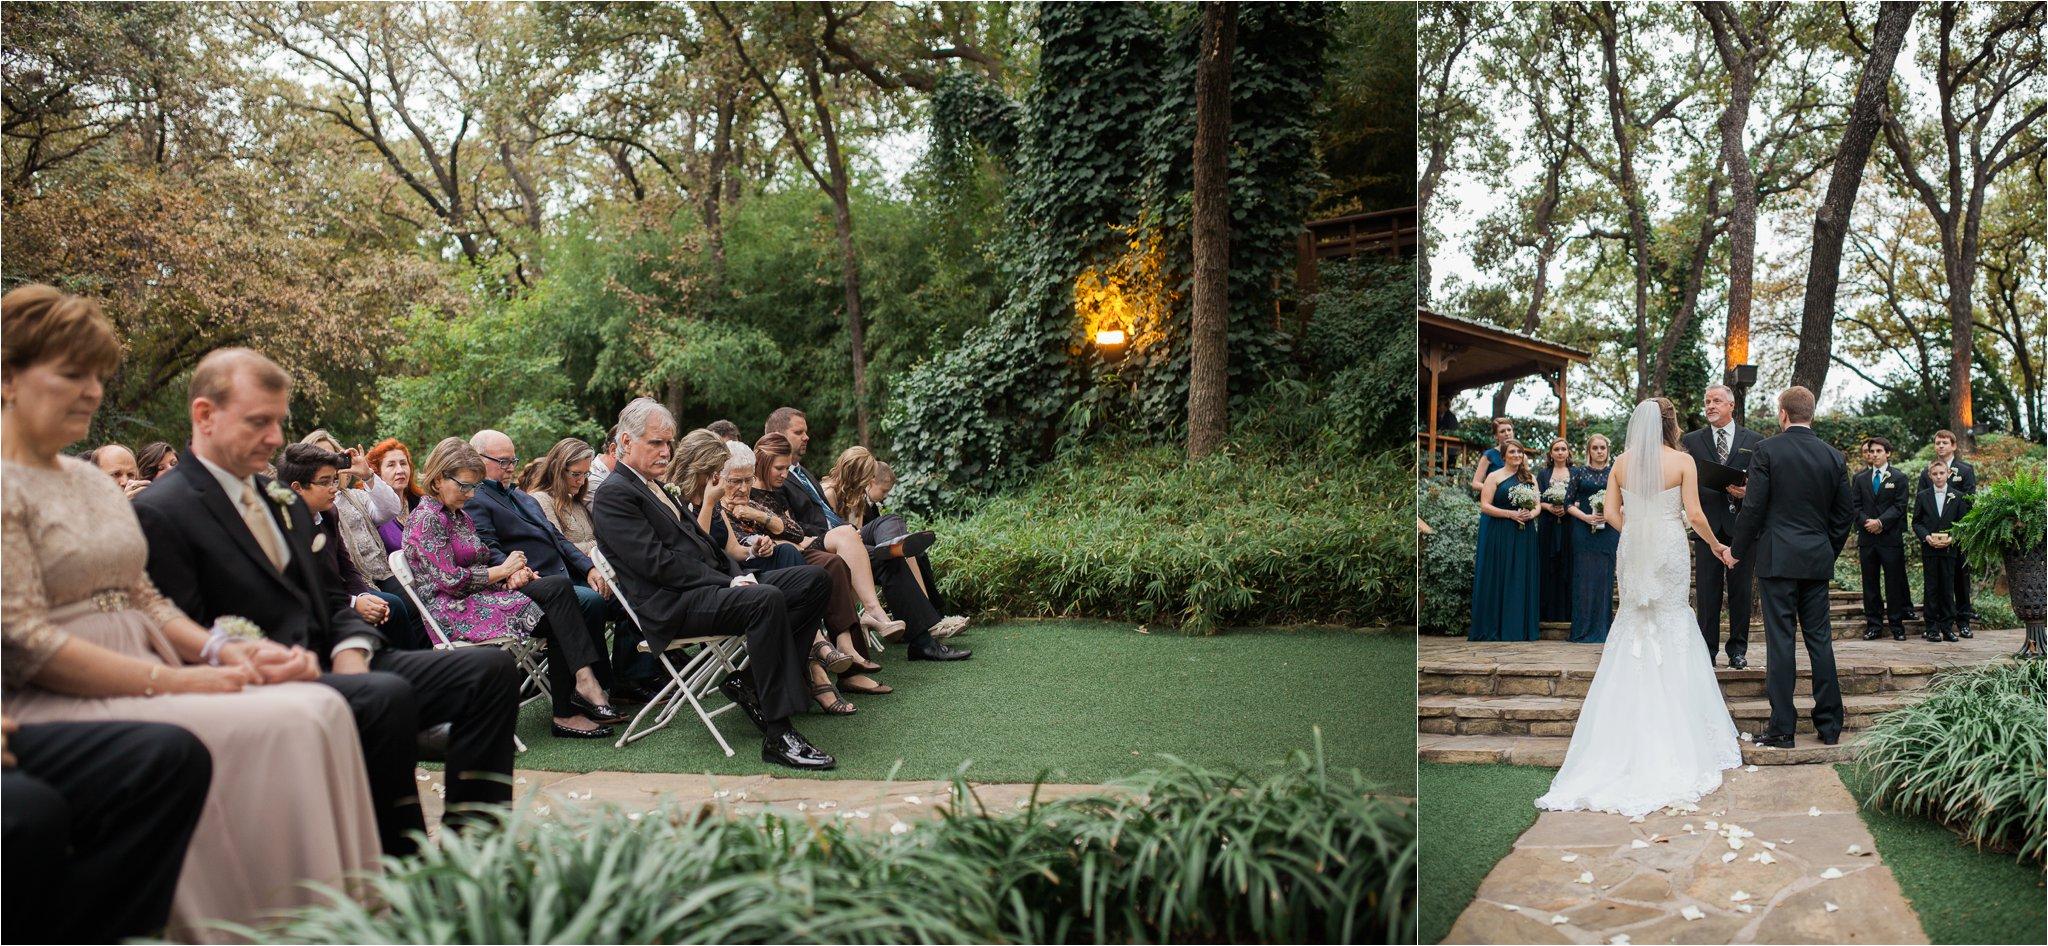 lunsford-wedding-608.jpg